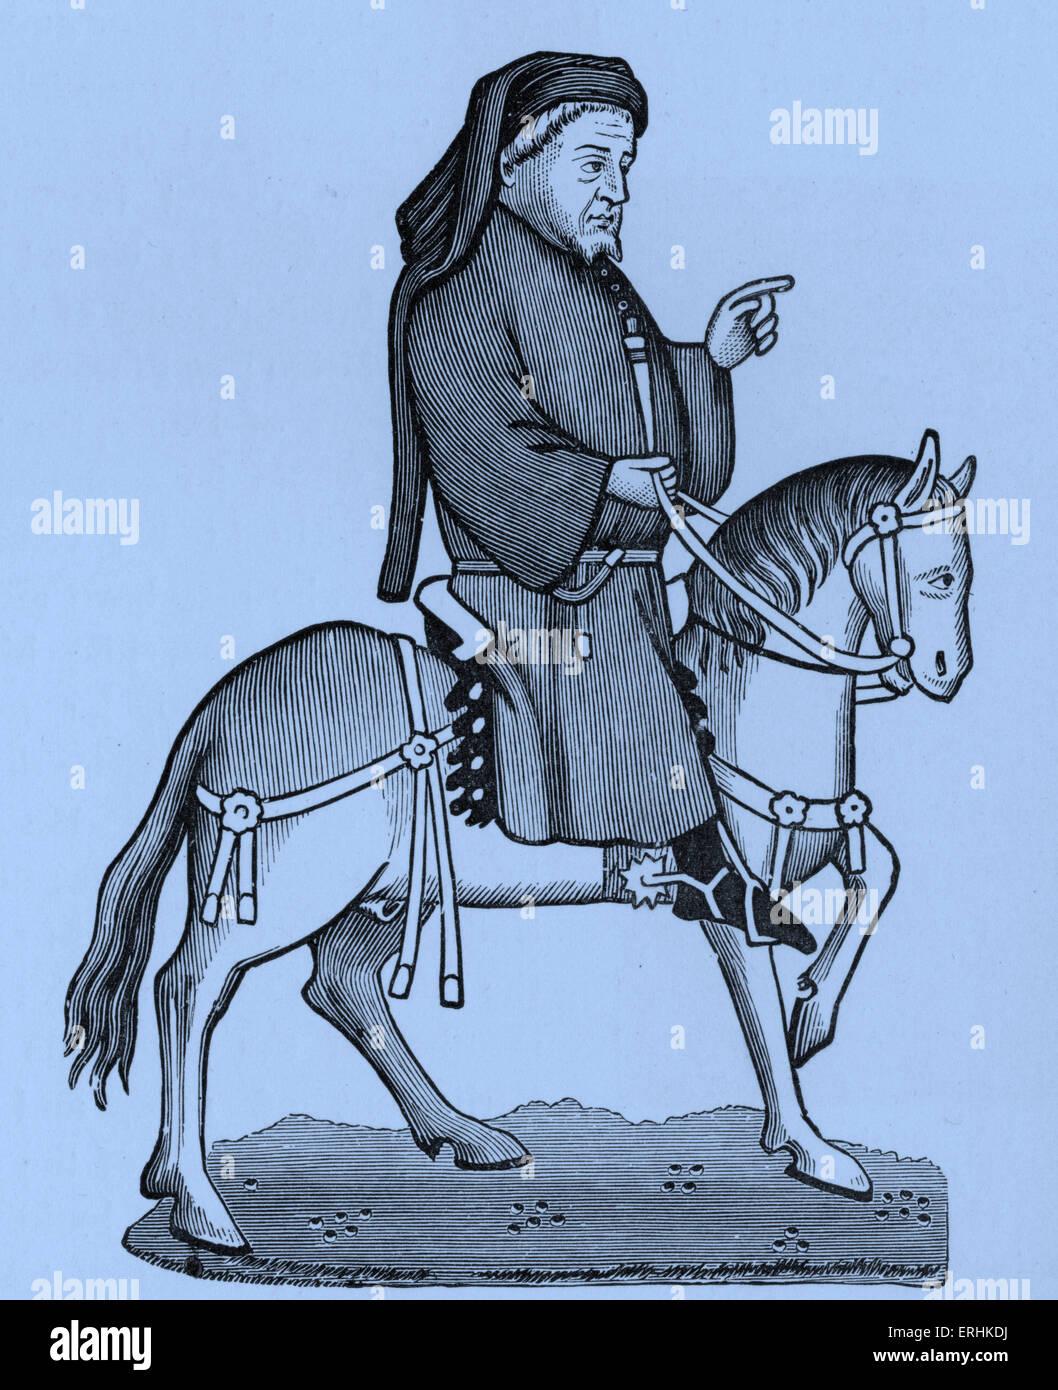 Geoffrey Chaucer - Portrait of the English poet on horseback. c. 1343-1400 - Stock Image